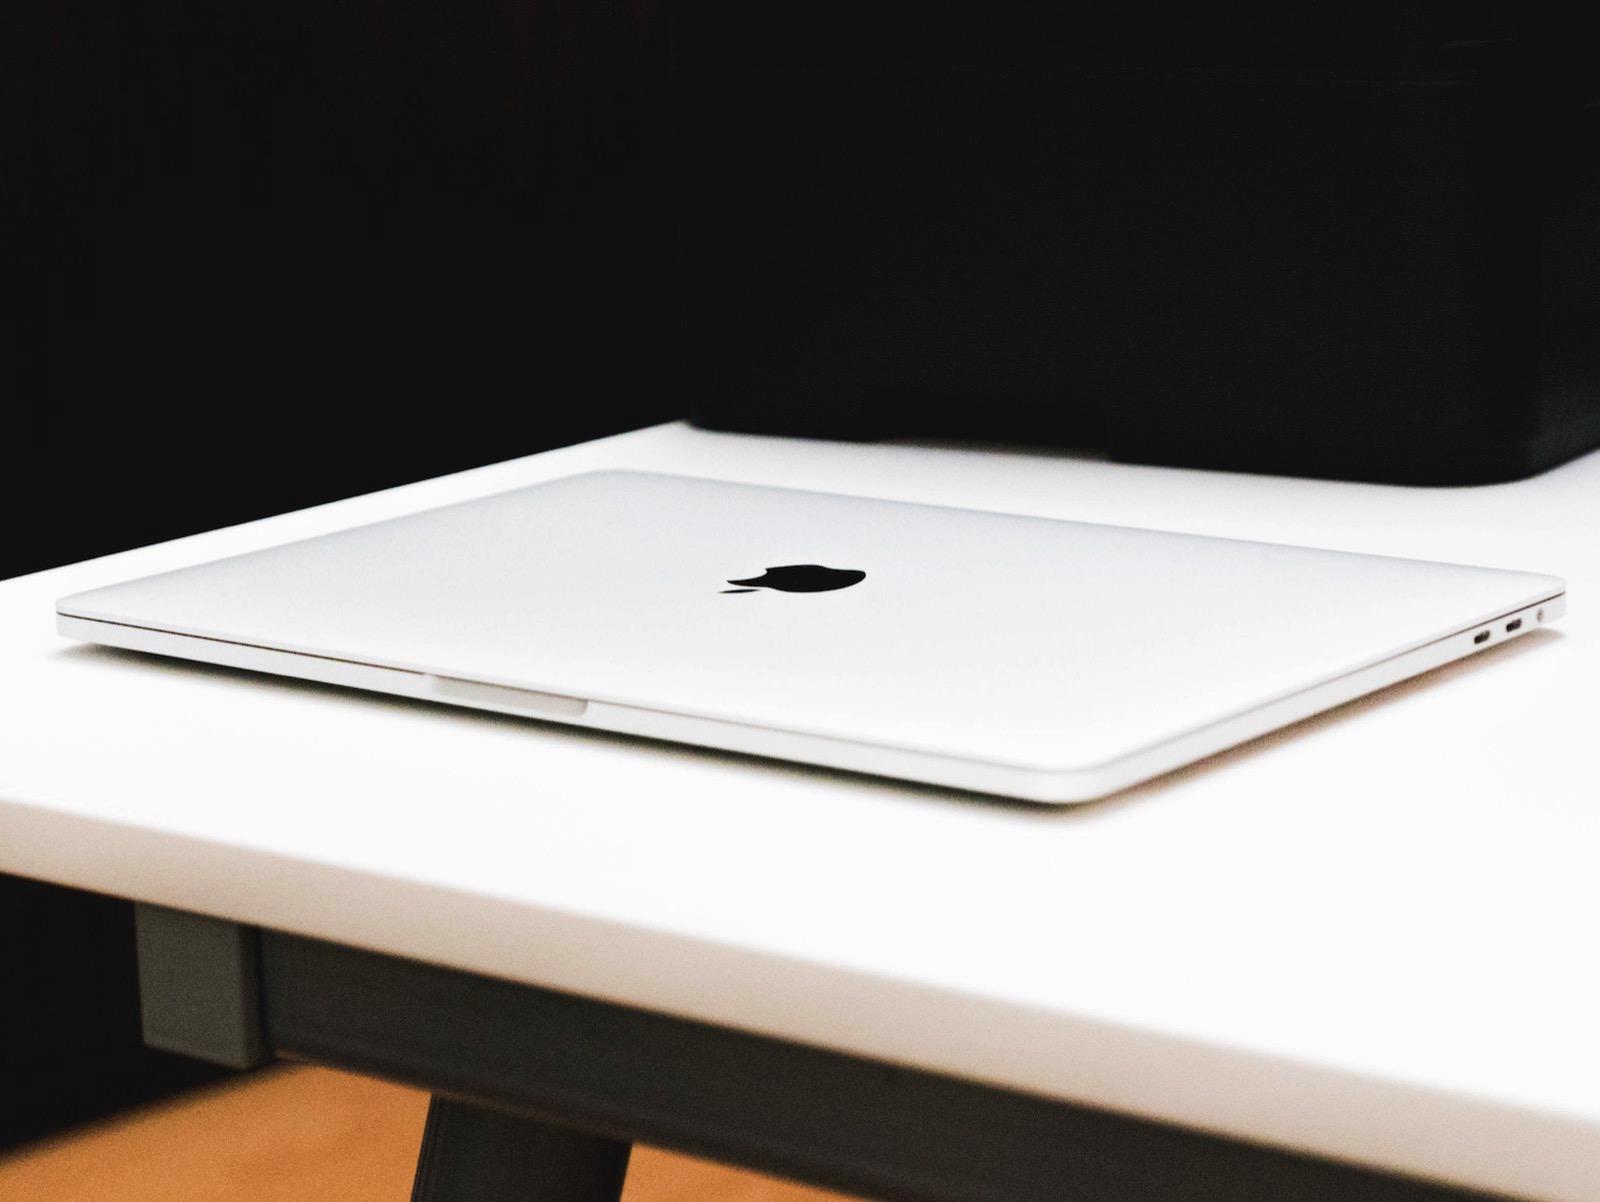 Iabzd 604210 unsplash macbook pro in white skin